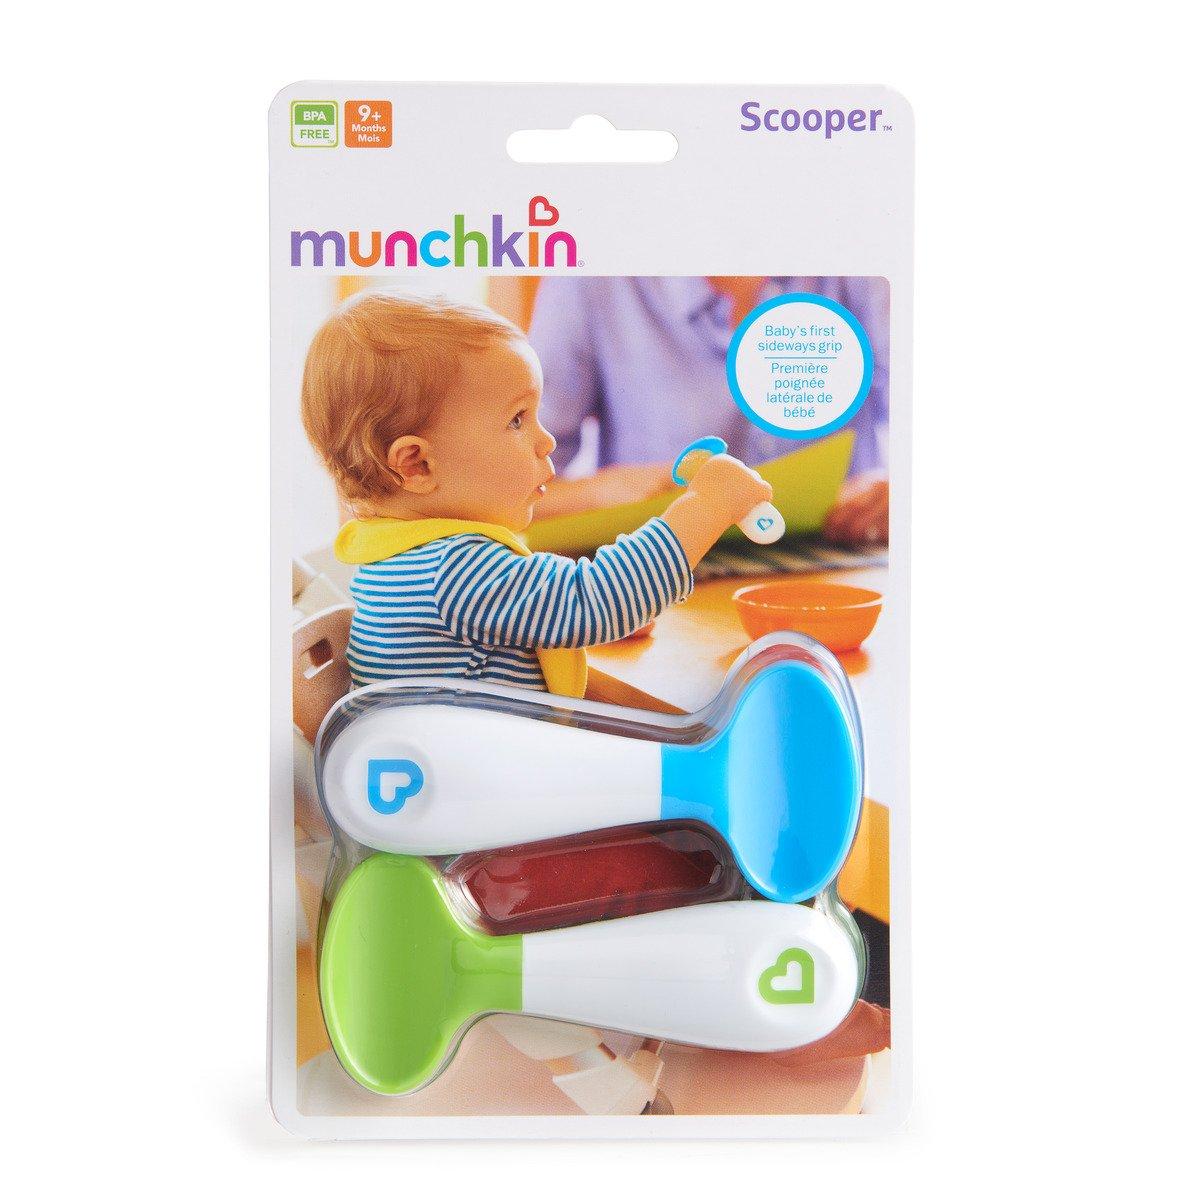 blau//gr/ün Munchkin Scooper Spoons Esslernl/öffel